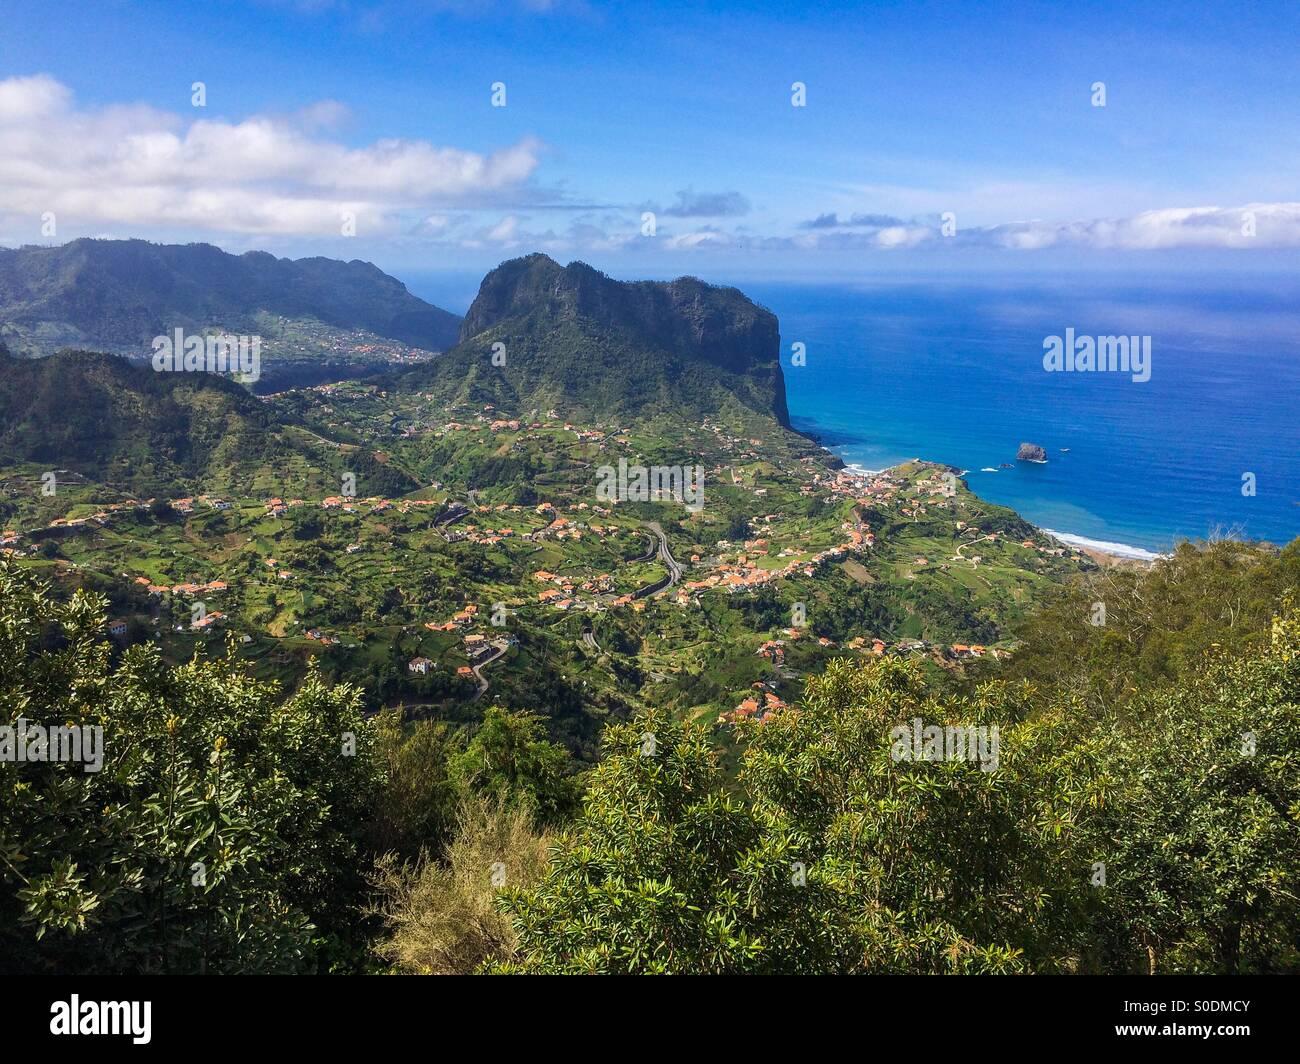 View looking down to Porto da Cruz on the Portuguese island of Madeira. - Stock Image